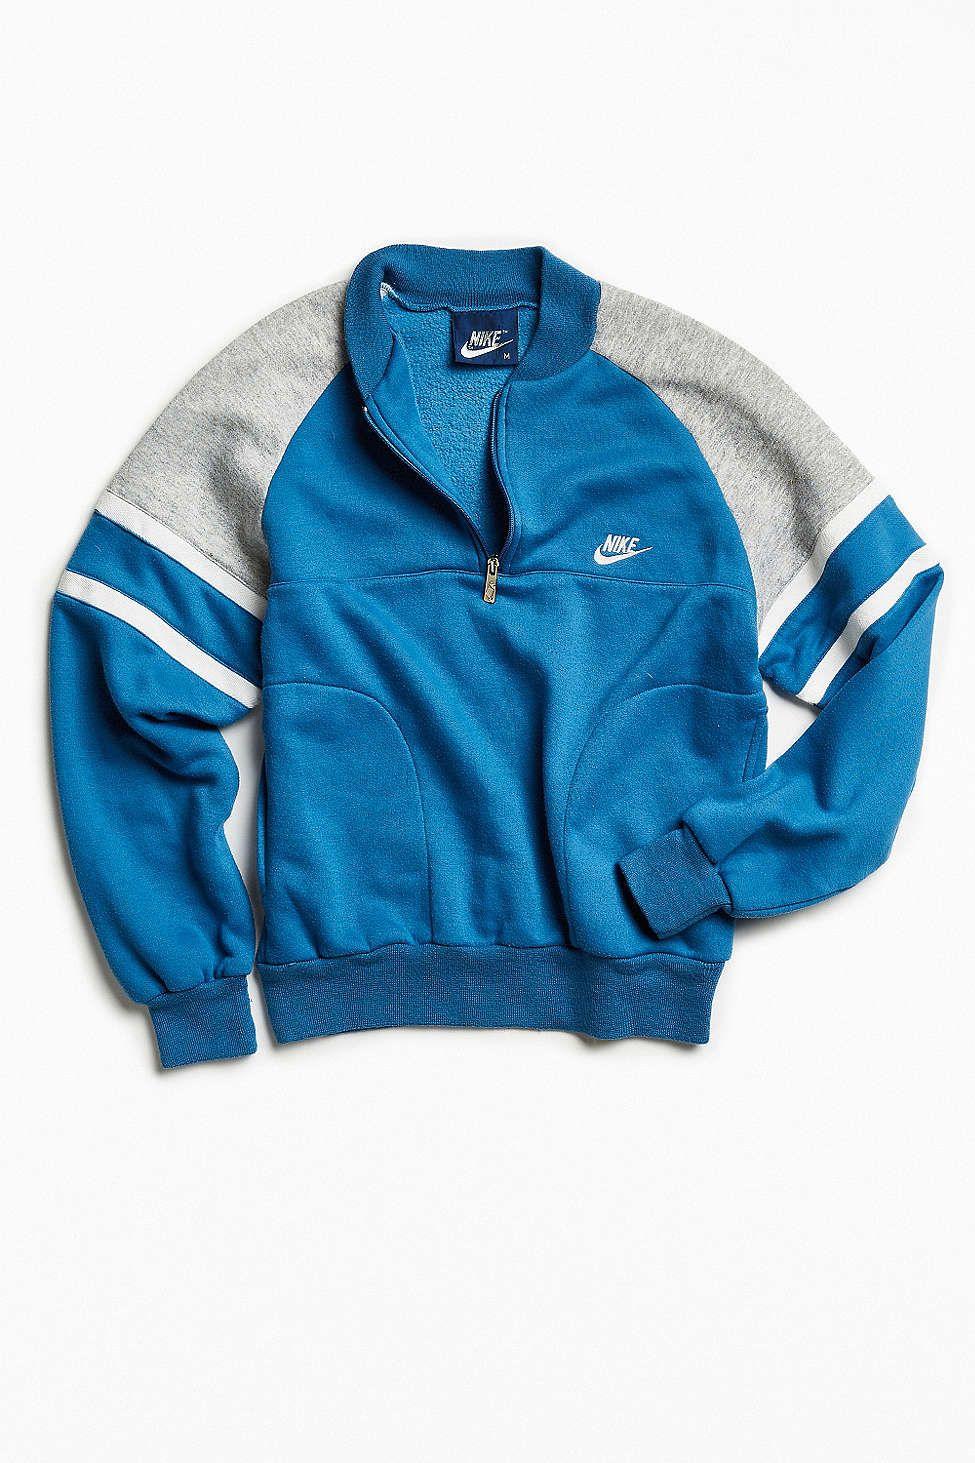 f7bf14472832 Vintage Nike 1 4-Zip Sweatshirt